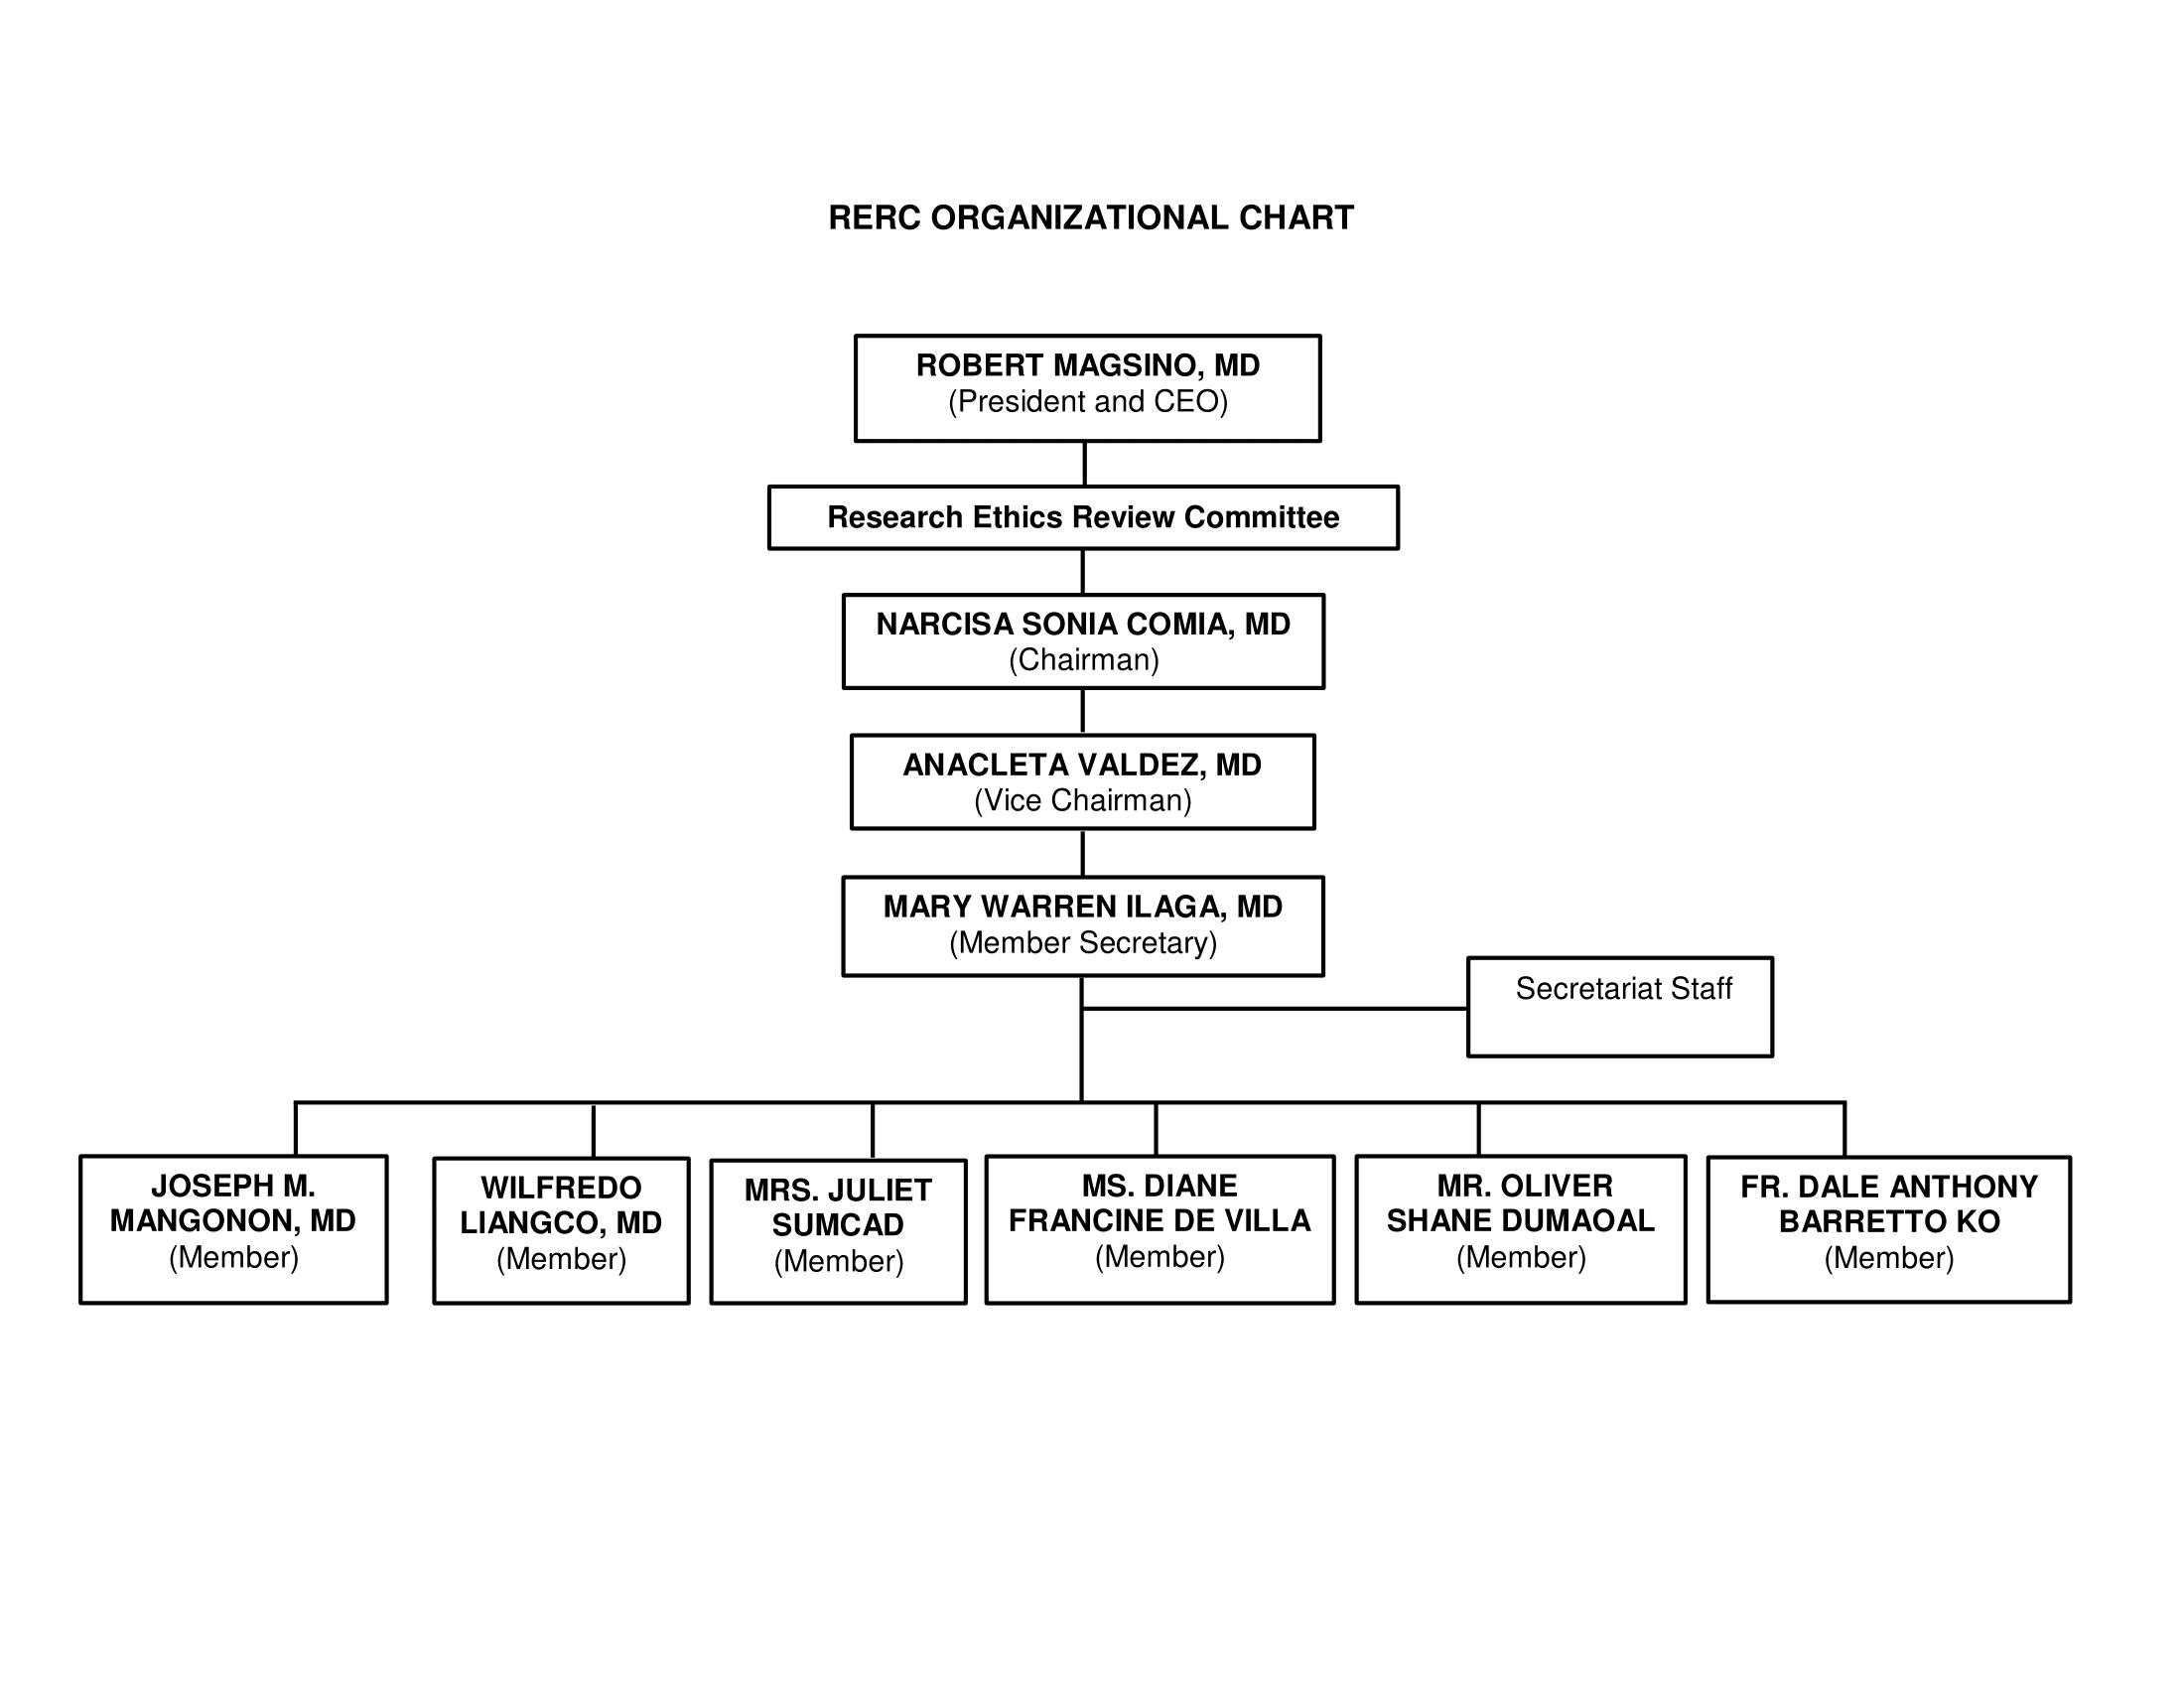 chart_image